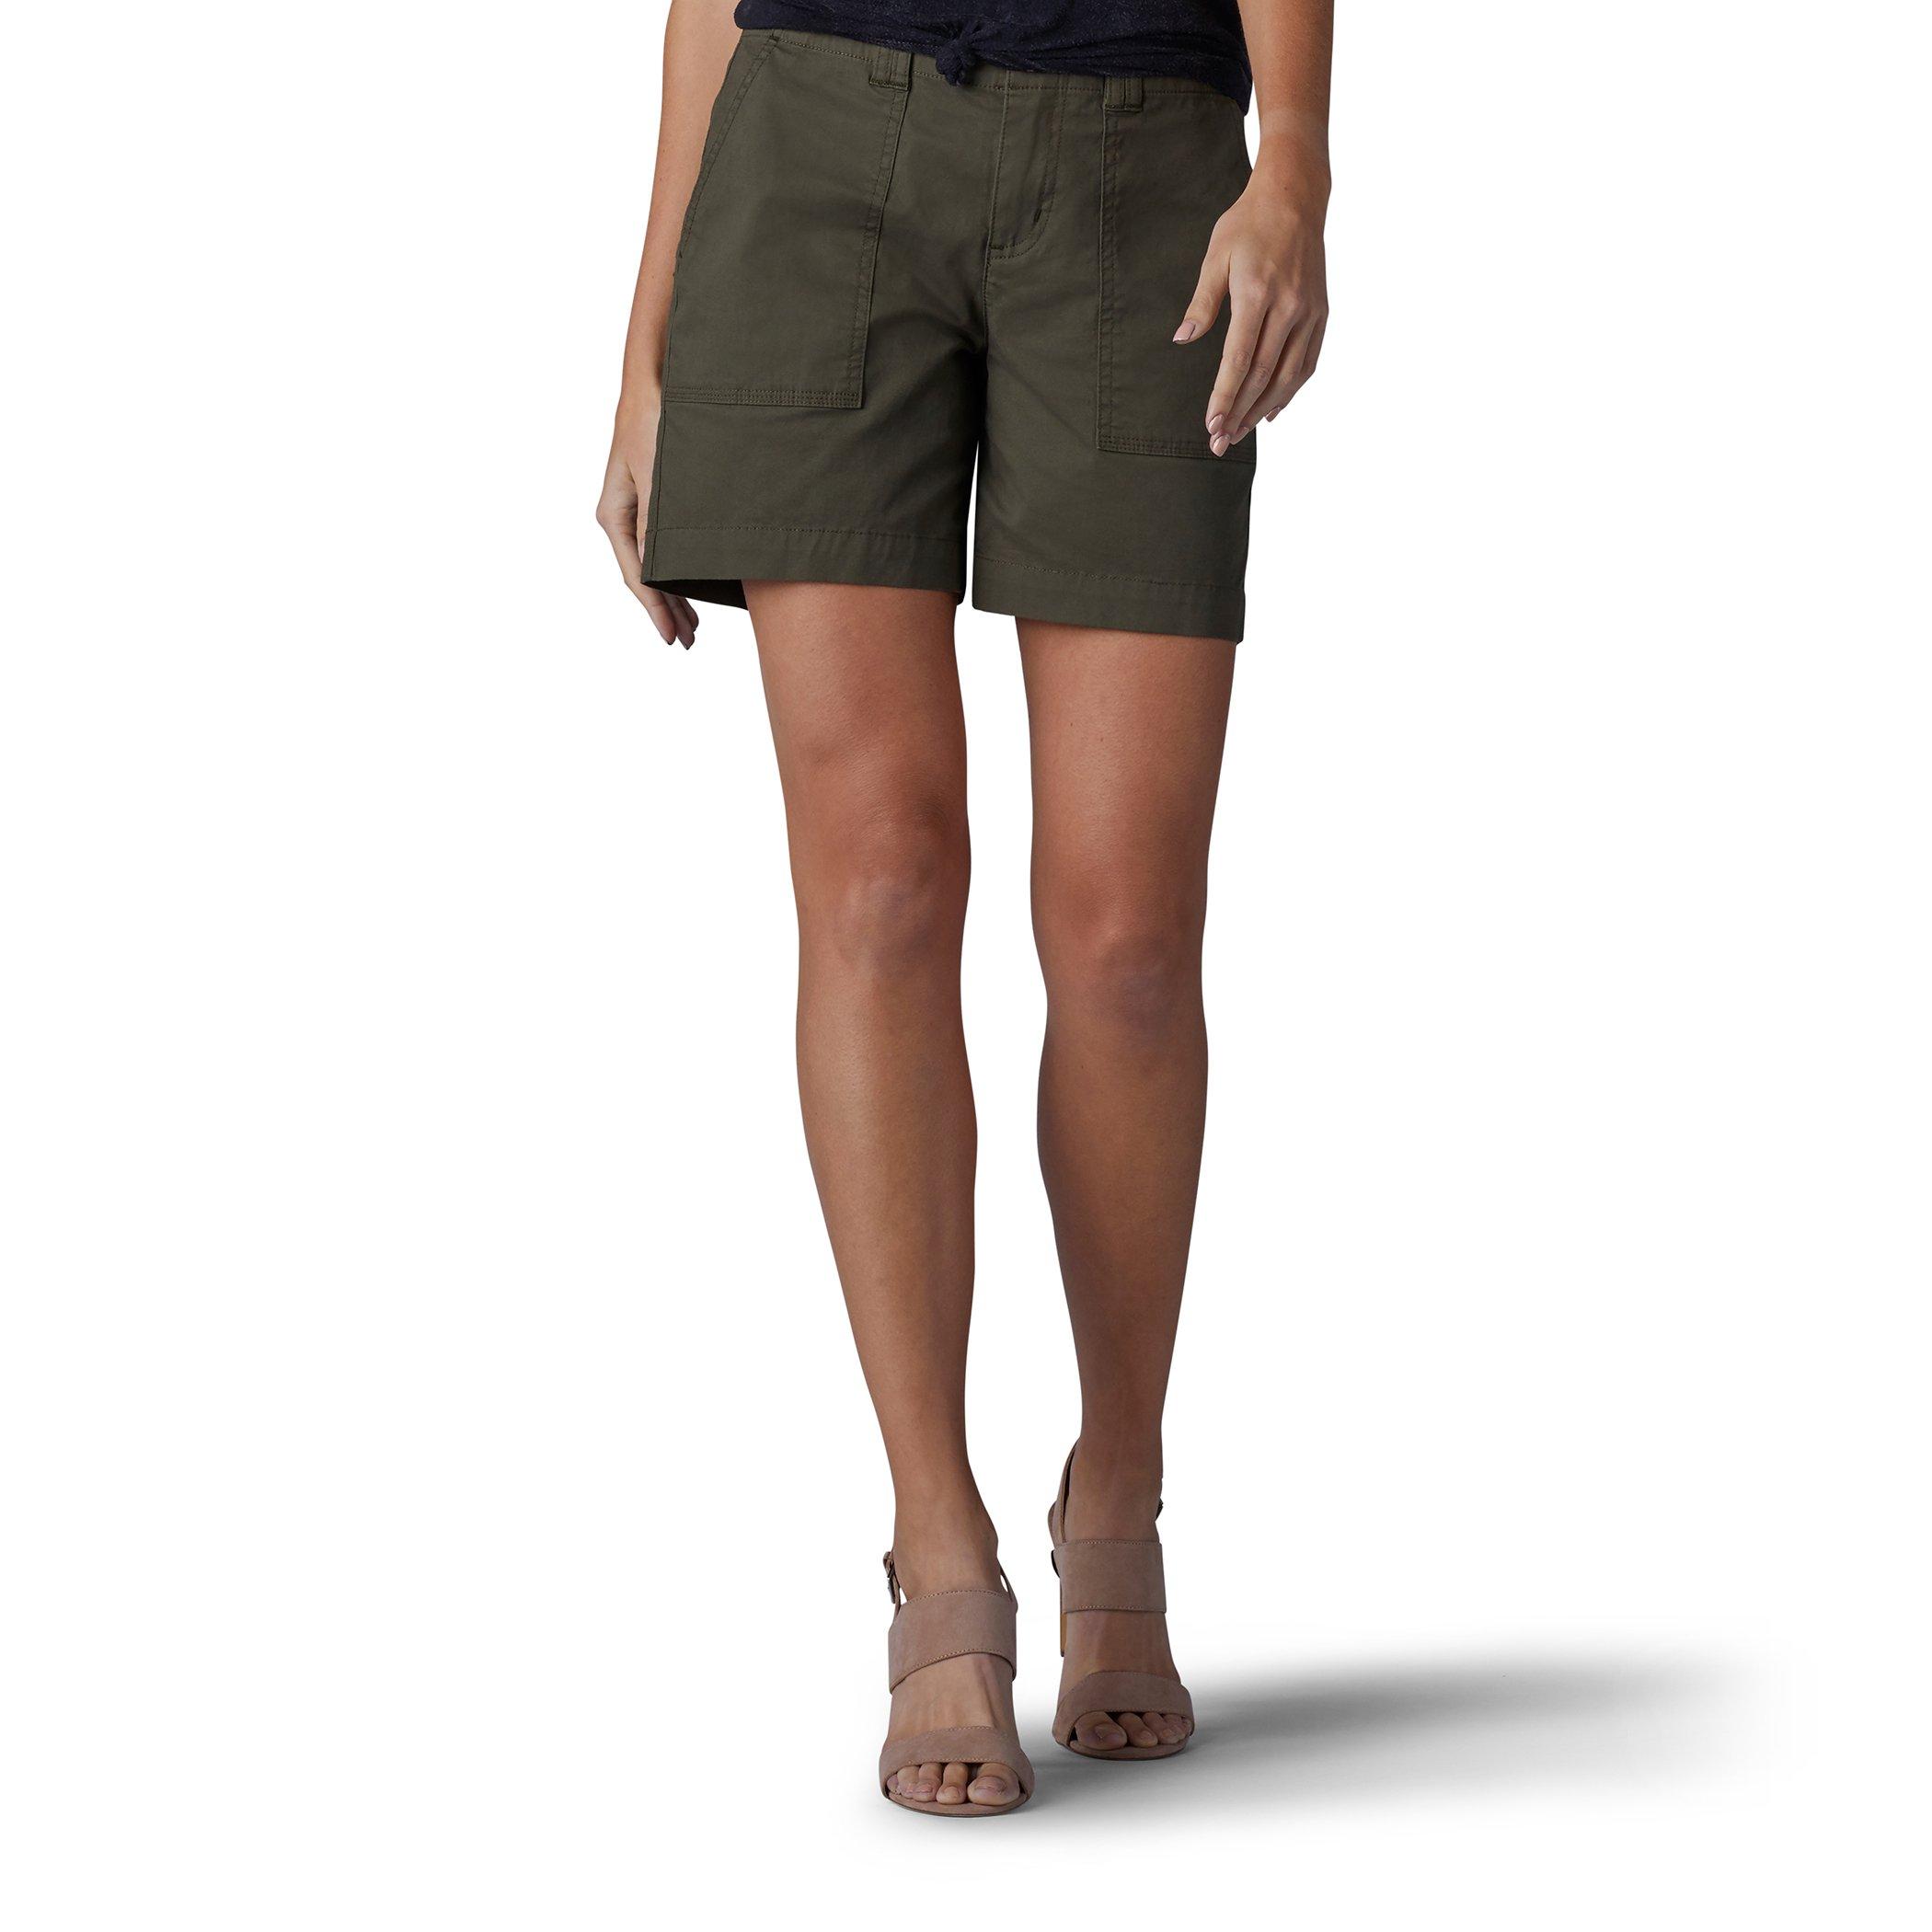 LEE Women's Straight Fit Kinsey Short, Moss, 4